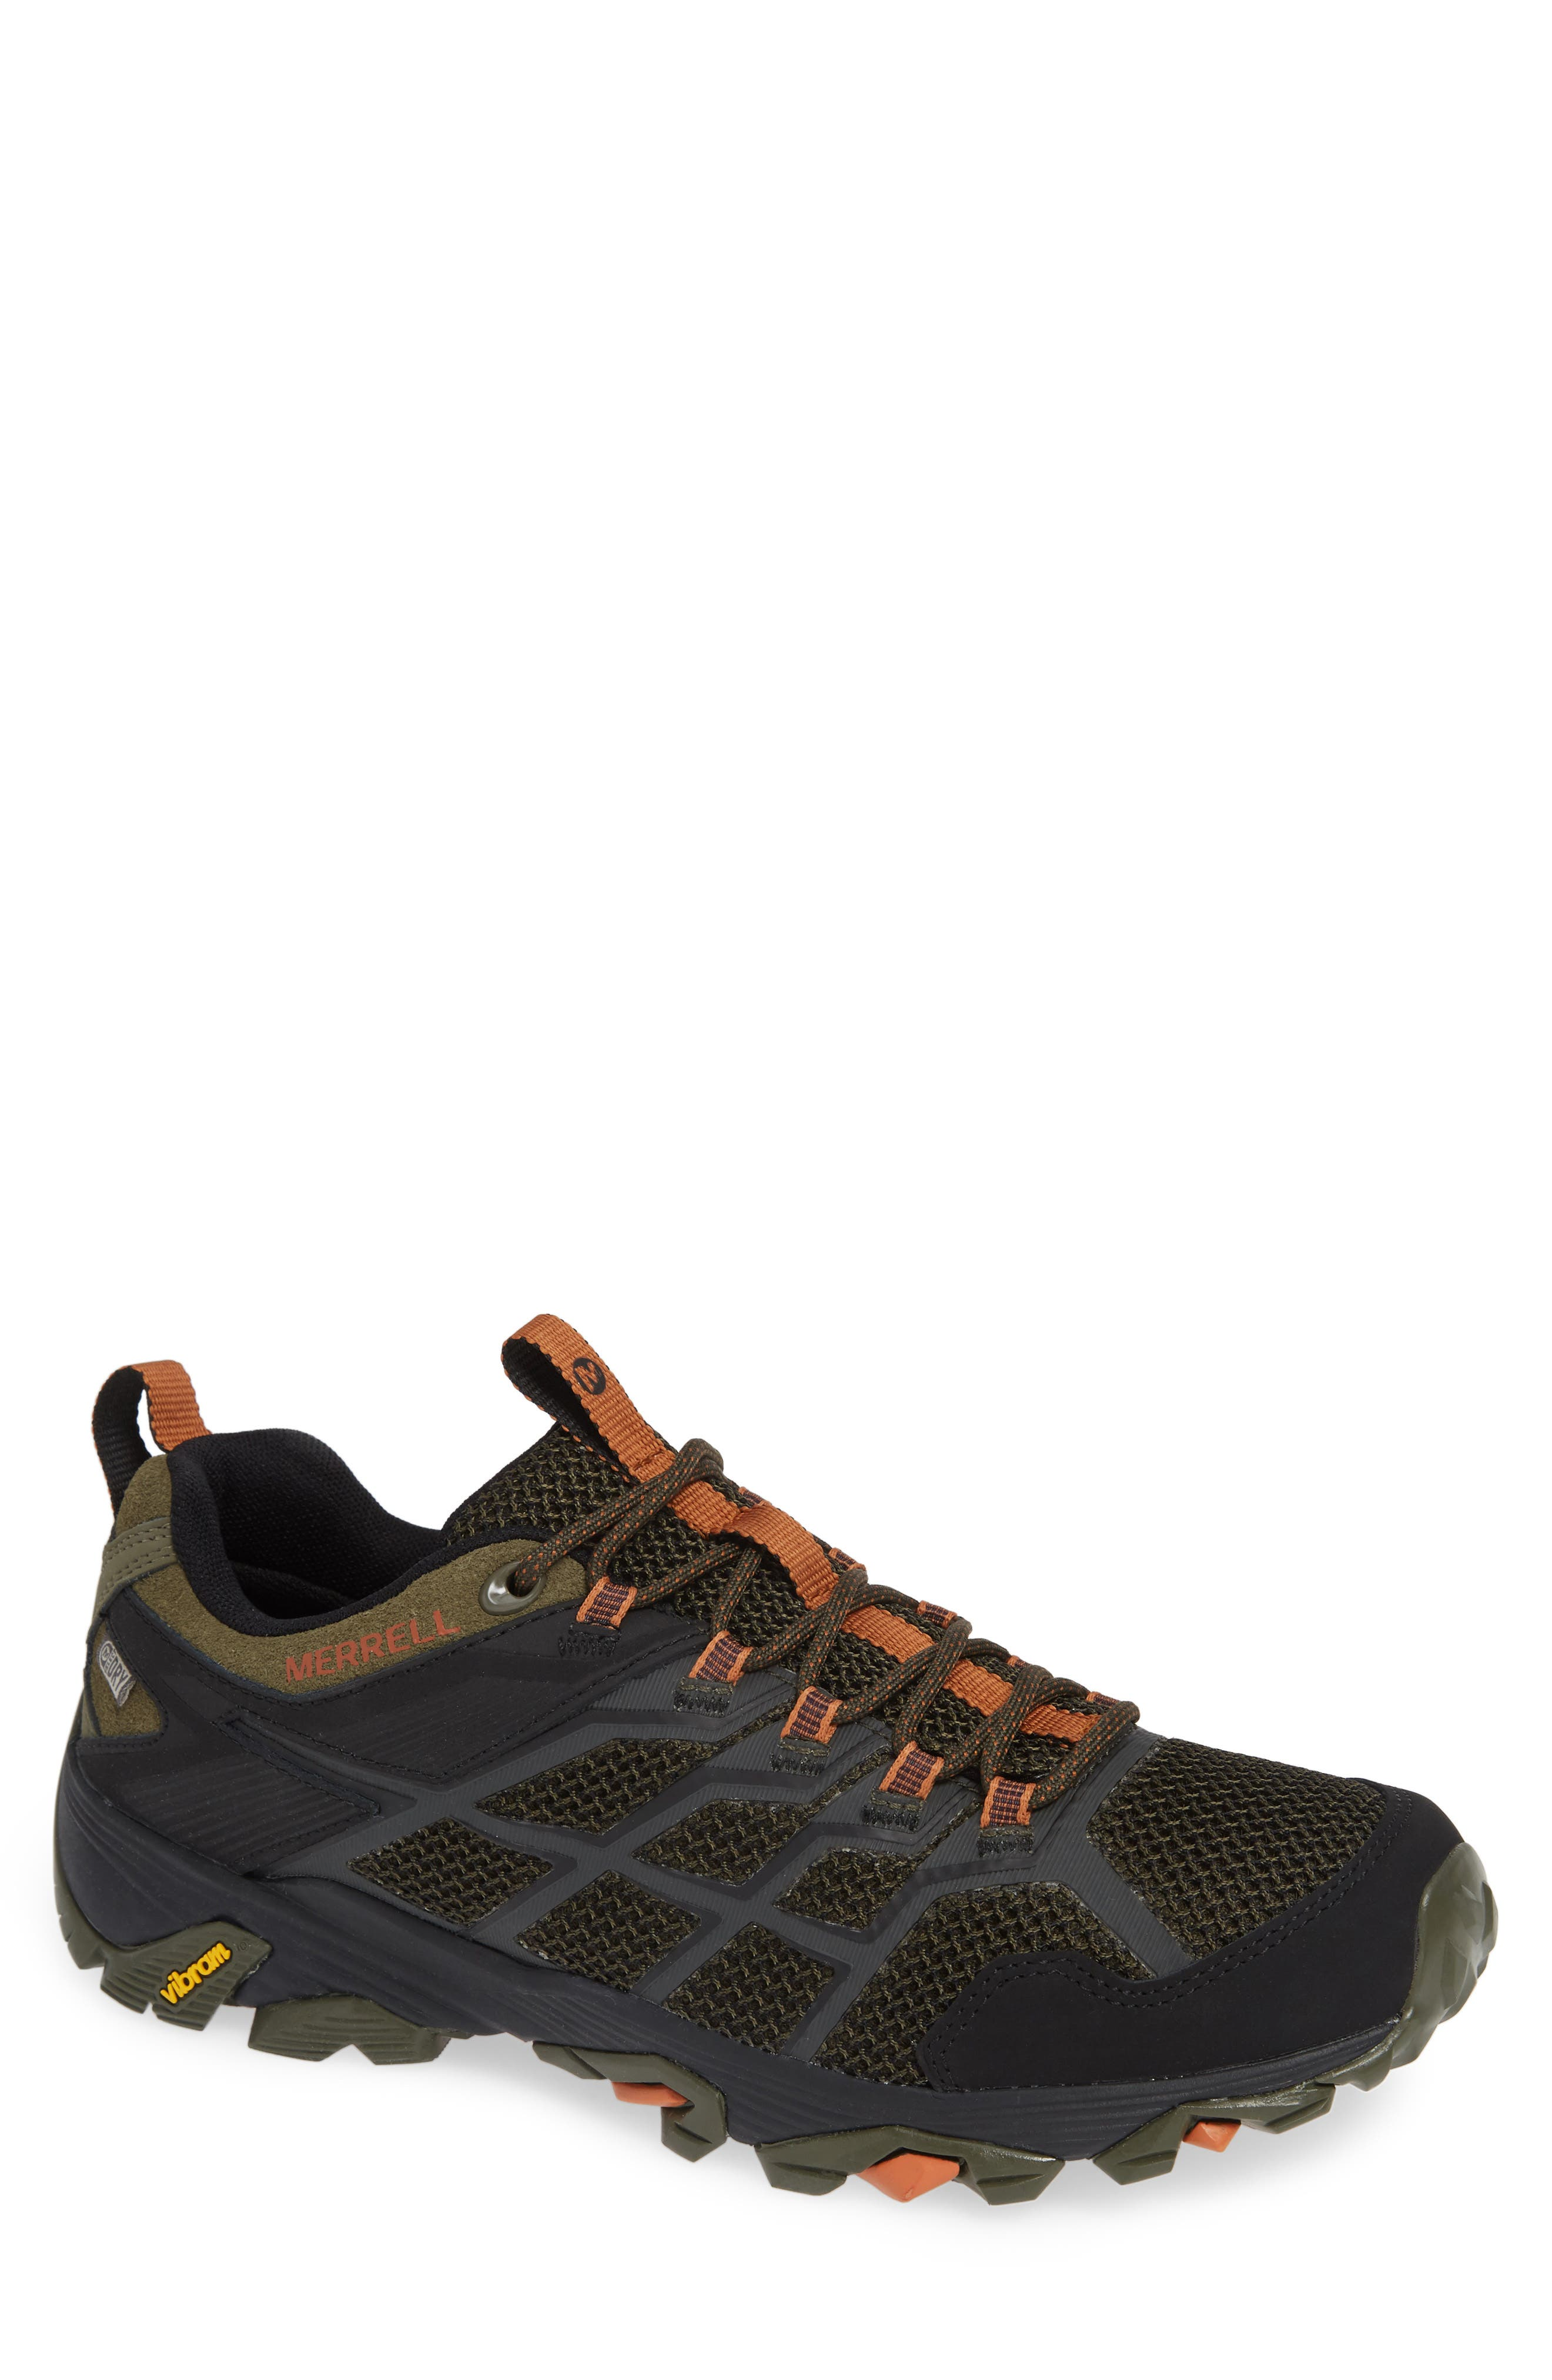 MERRELL, Moab FST 2 Waterproof Hiking Shoe, Main thumbnail 1, color, OLIVE/ ADOBE